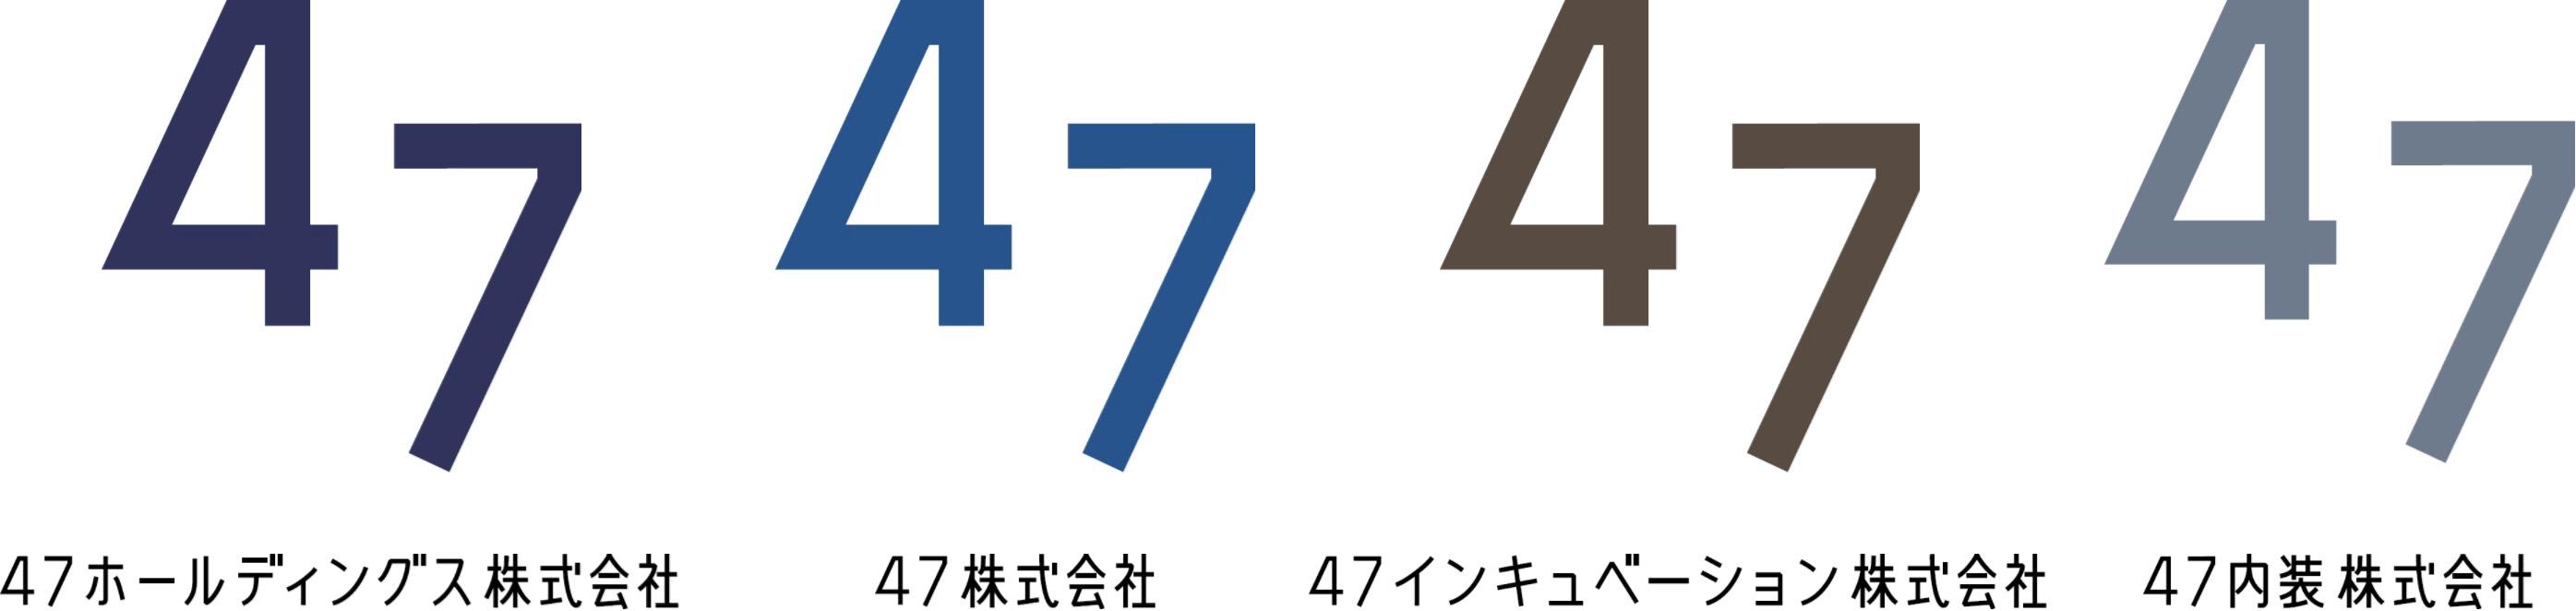 D20583-2-517372-0